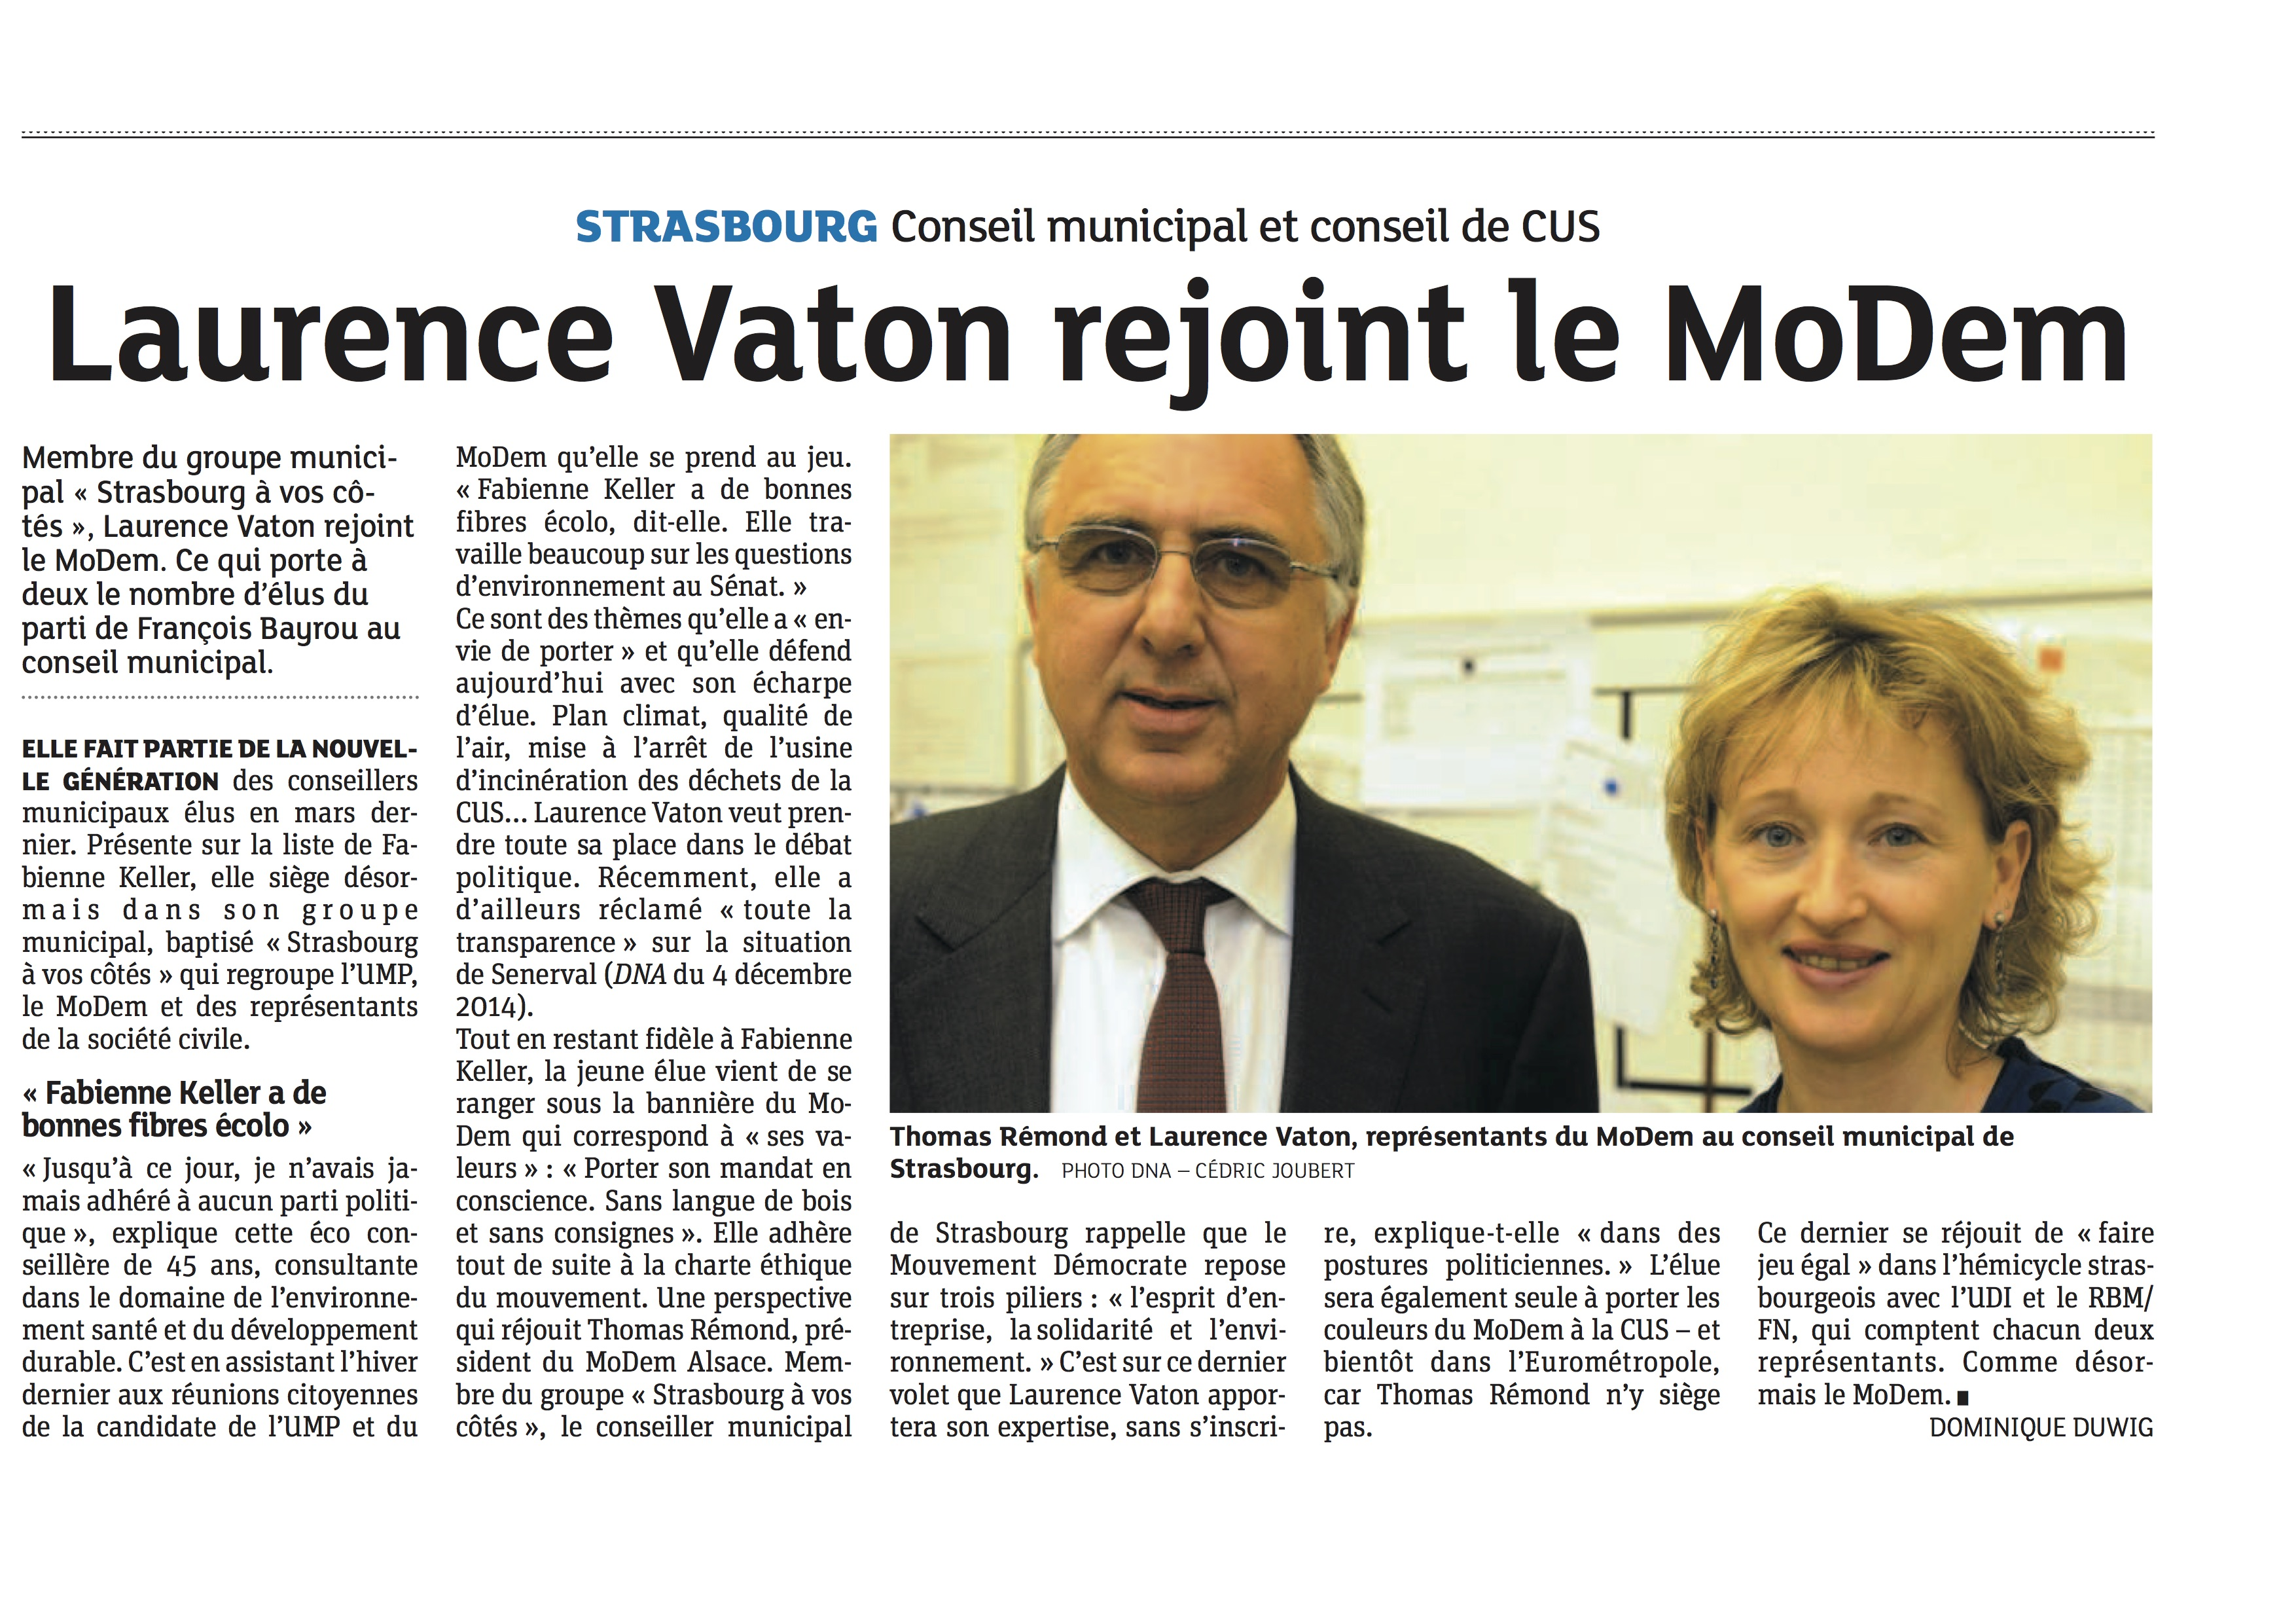 2014.12.09 - DNA-Strasbourg Laurence Vaton MoDem